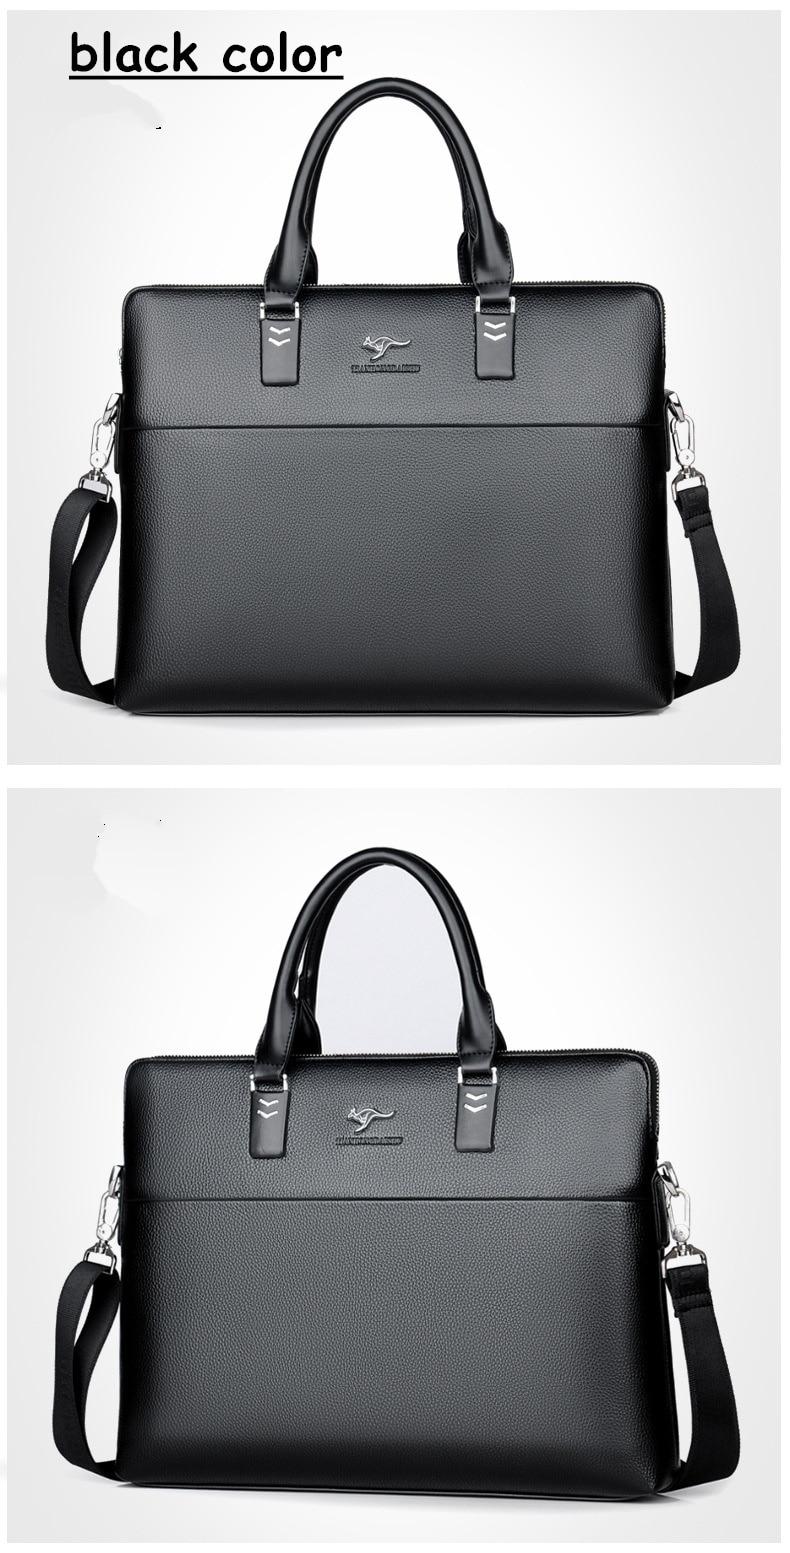 HTB1NsFVXWagSKJjy0Fcq6AZeVXaU TIANHONGDAISHU Men Casual Briefcase Business Shoulder Leather Messenger Bags Computer Laptop Handbag Men's Travel Bags handbags